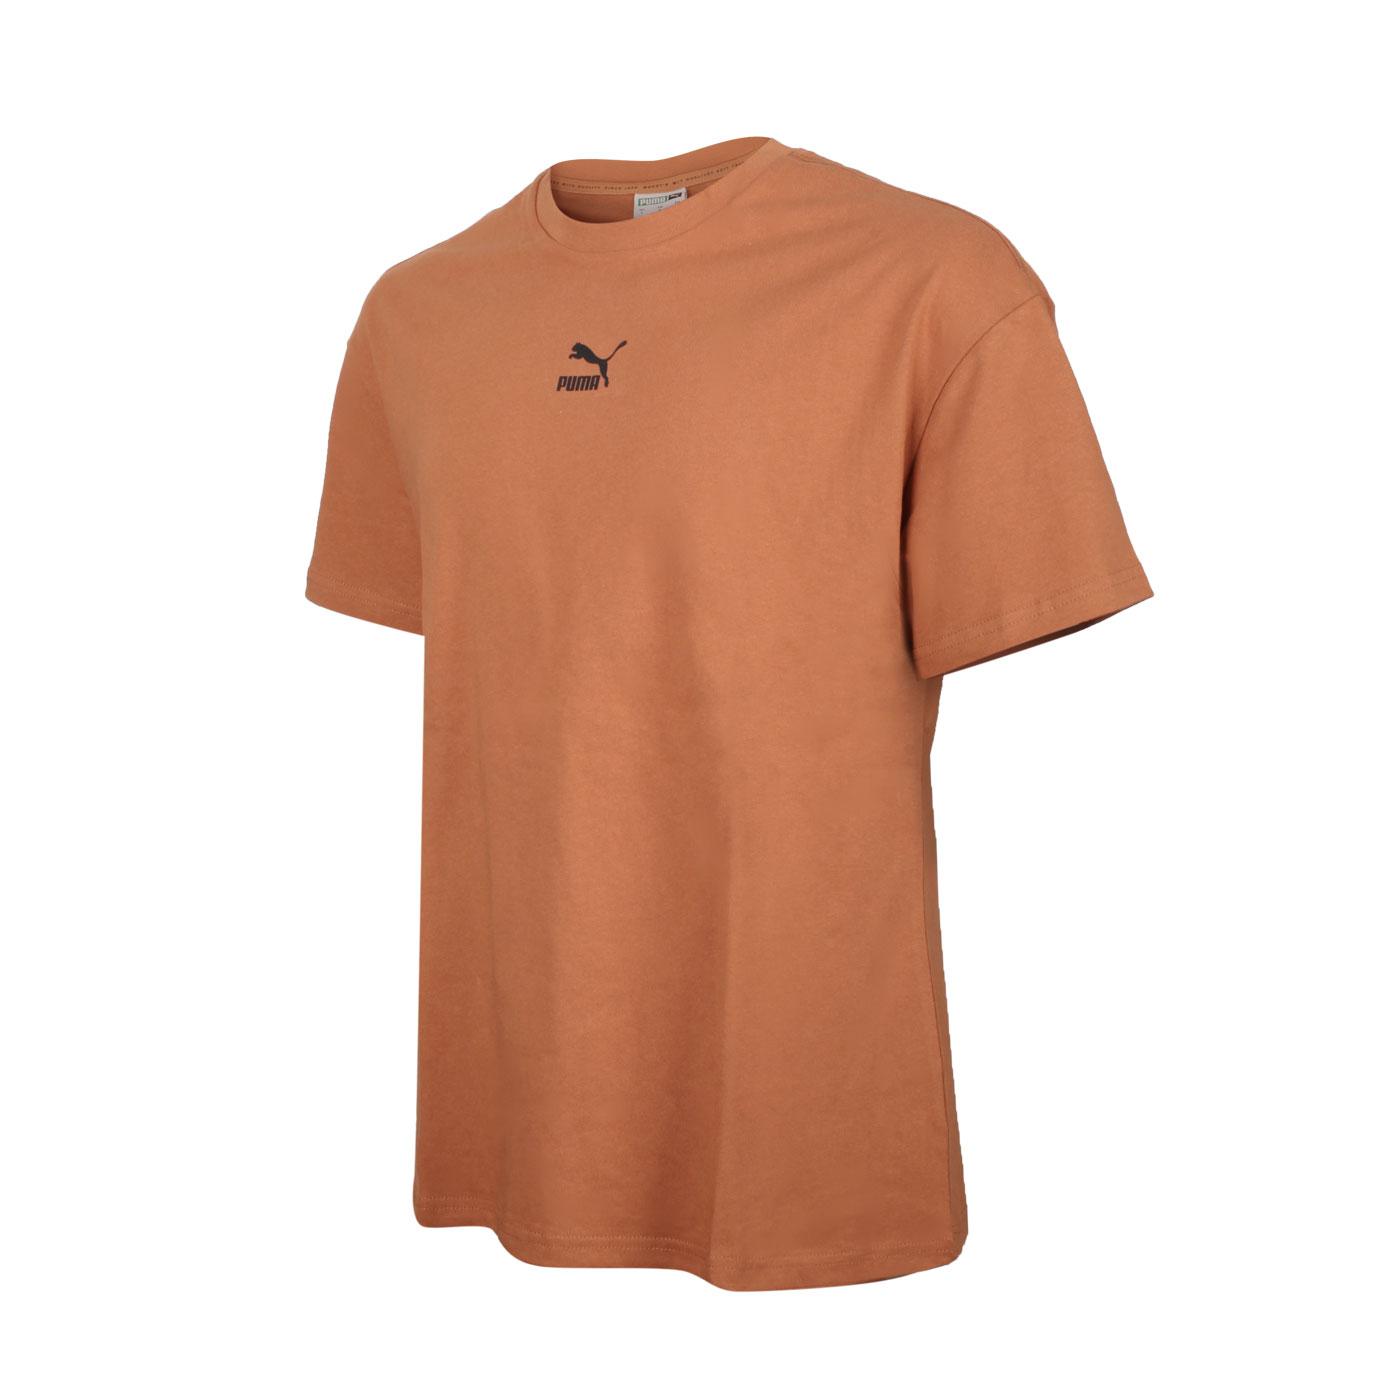 PUMA 男款流行系列Classics寬鬆短袖T恤 53213517 - 磚紅黑